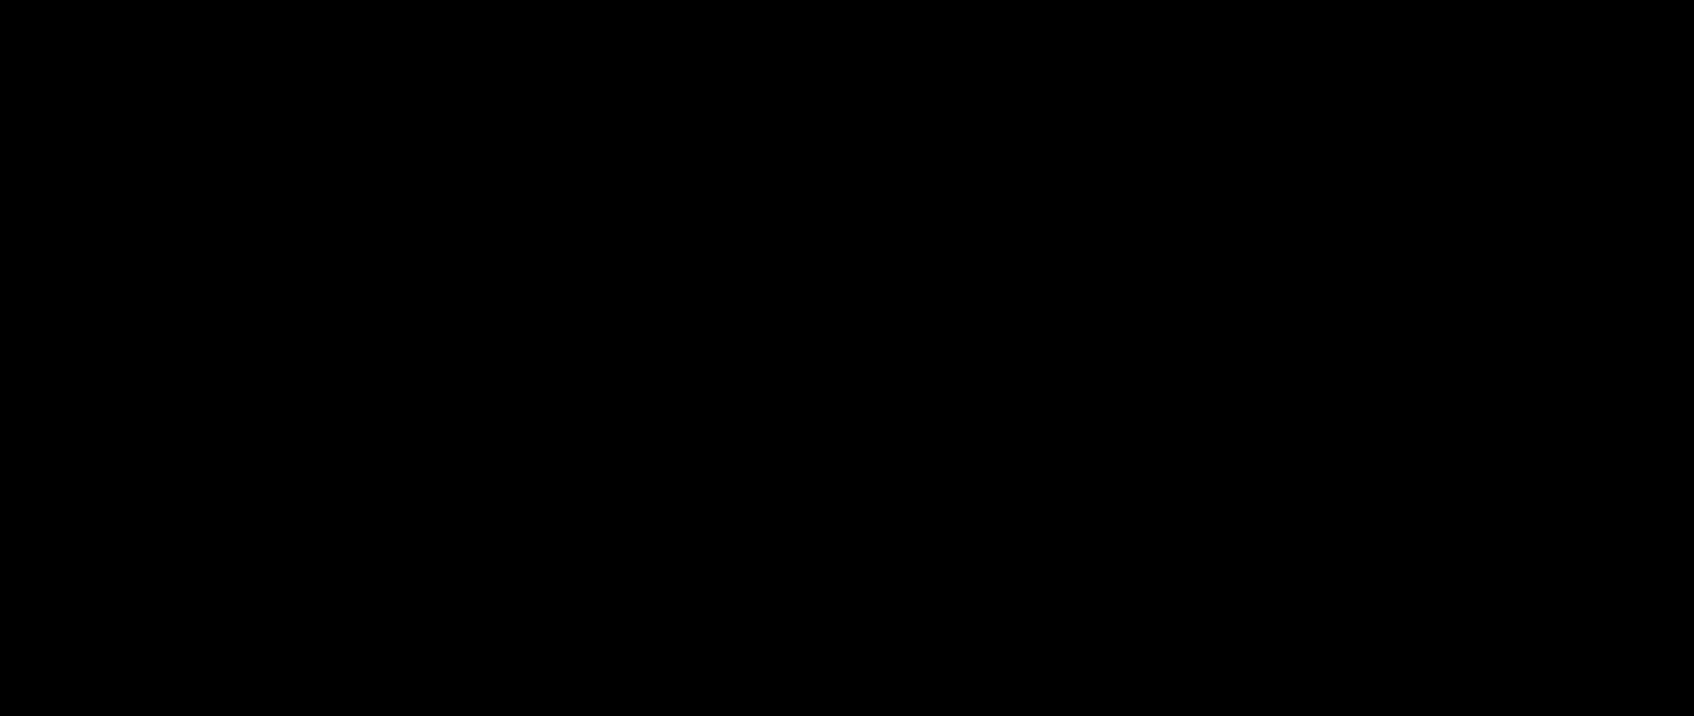 N-(1-Methylpropyl)-1,4-benzenediamine